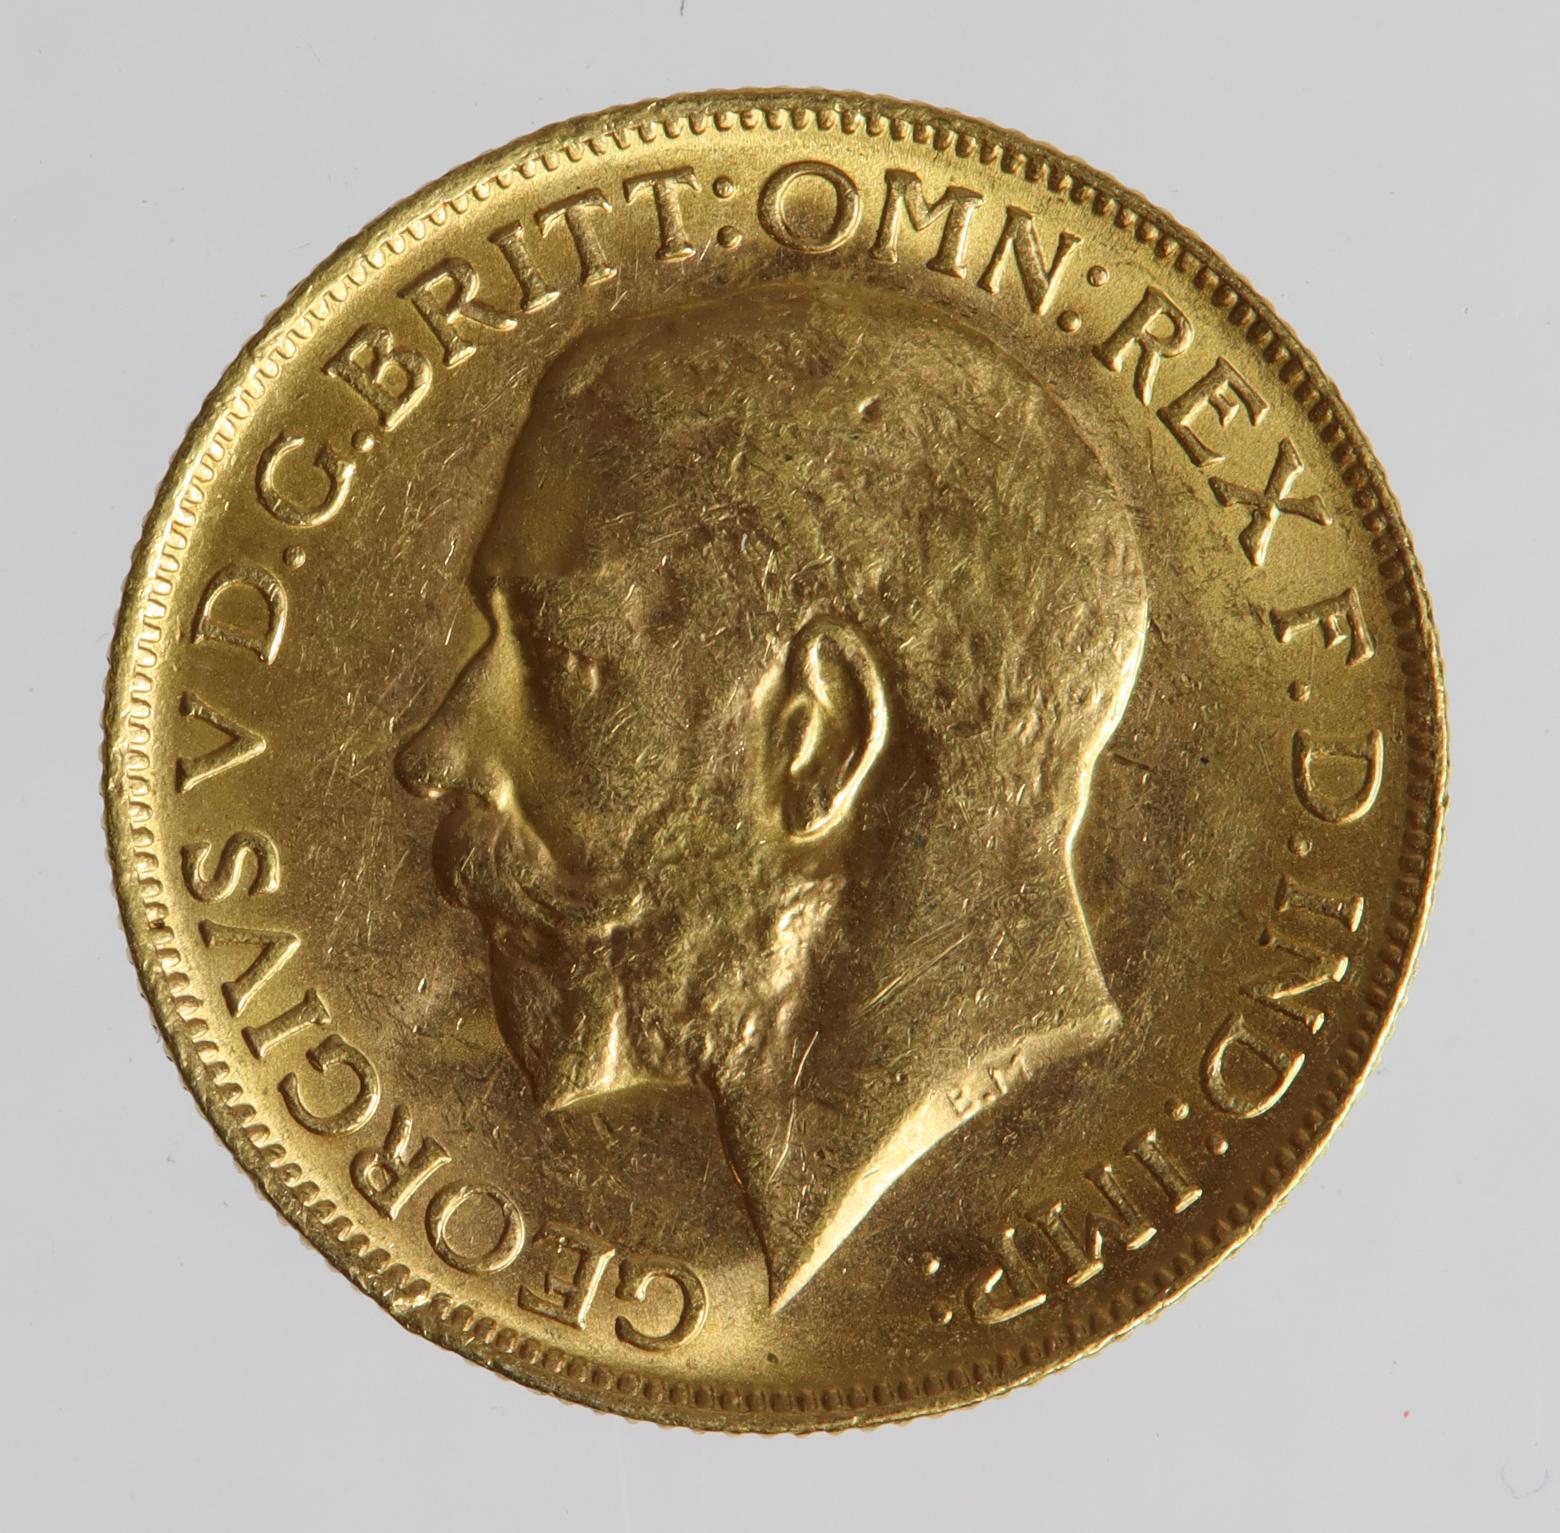 Sovereign 1919P, Perth Mint, Australia, GEF with a few edge nicks.